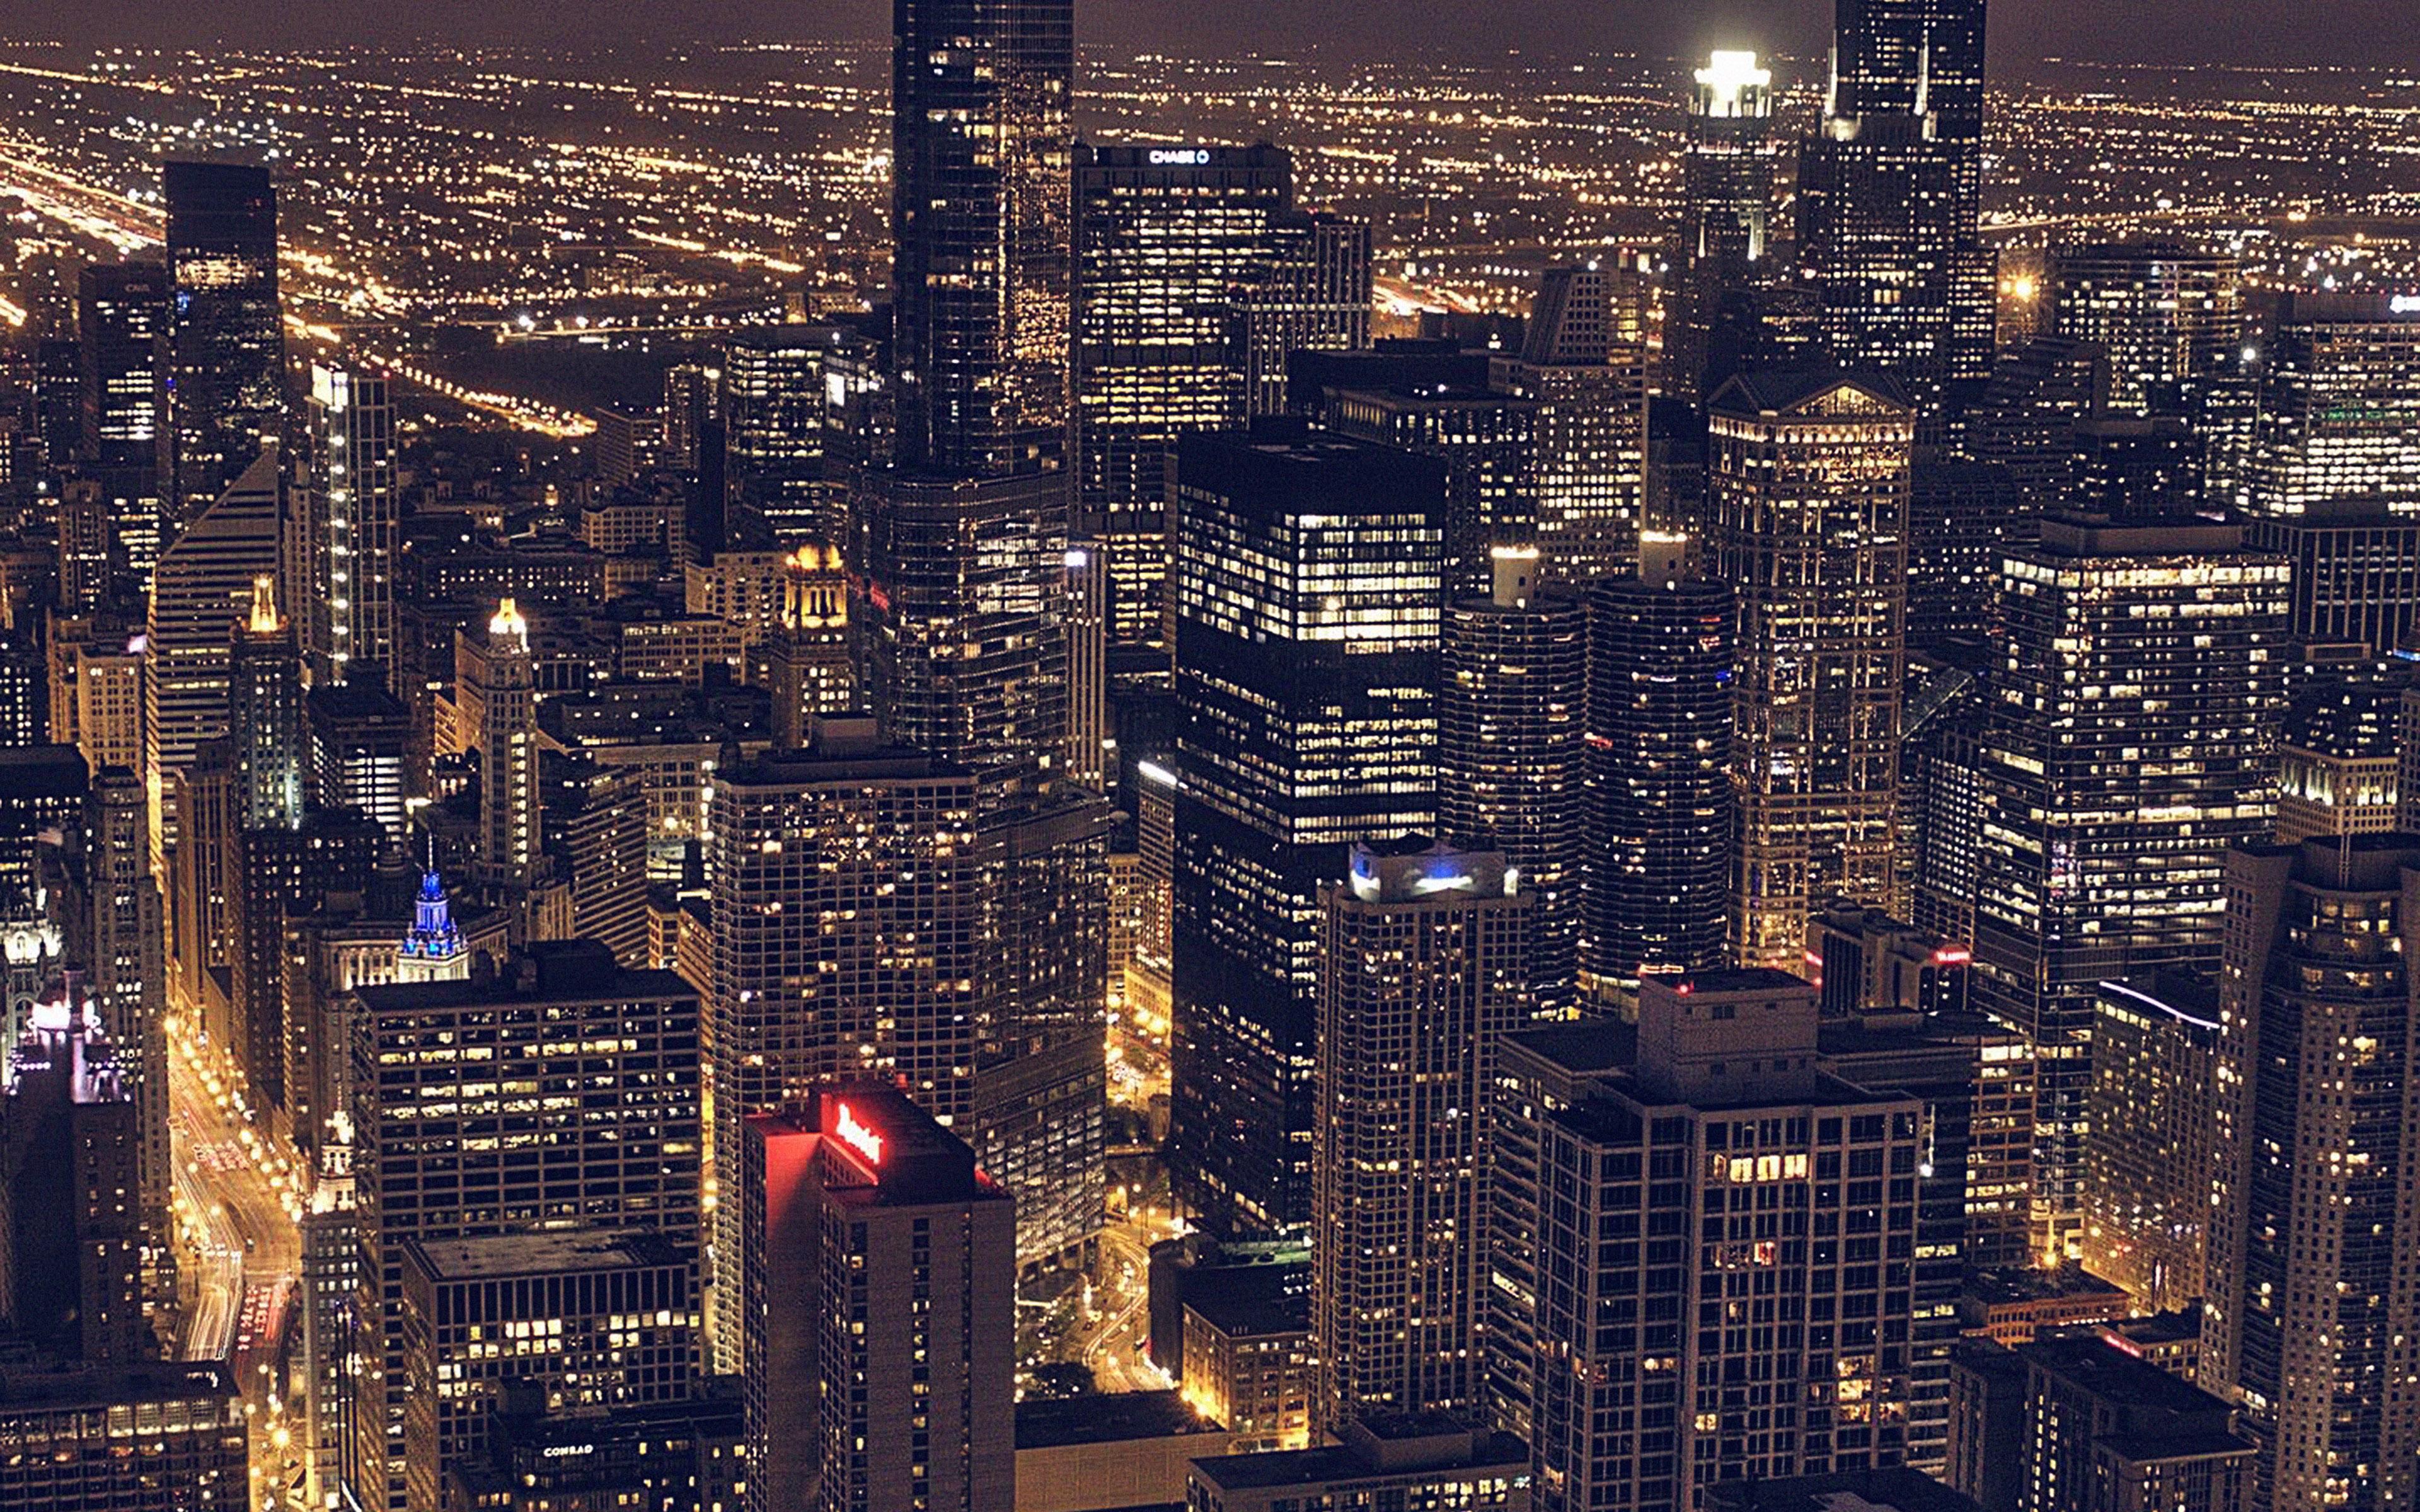 ml83-city-view-night-dark - papers.co